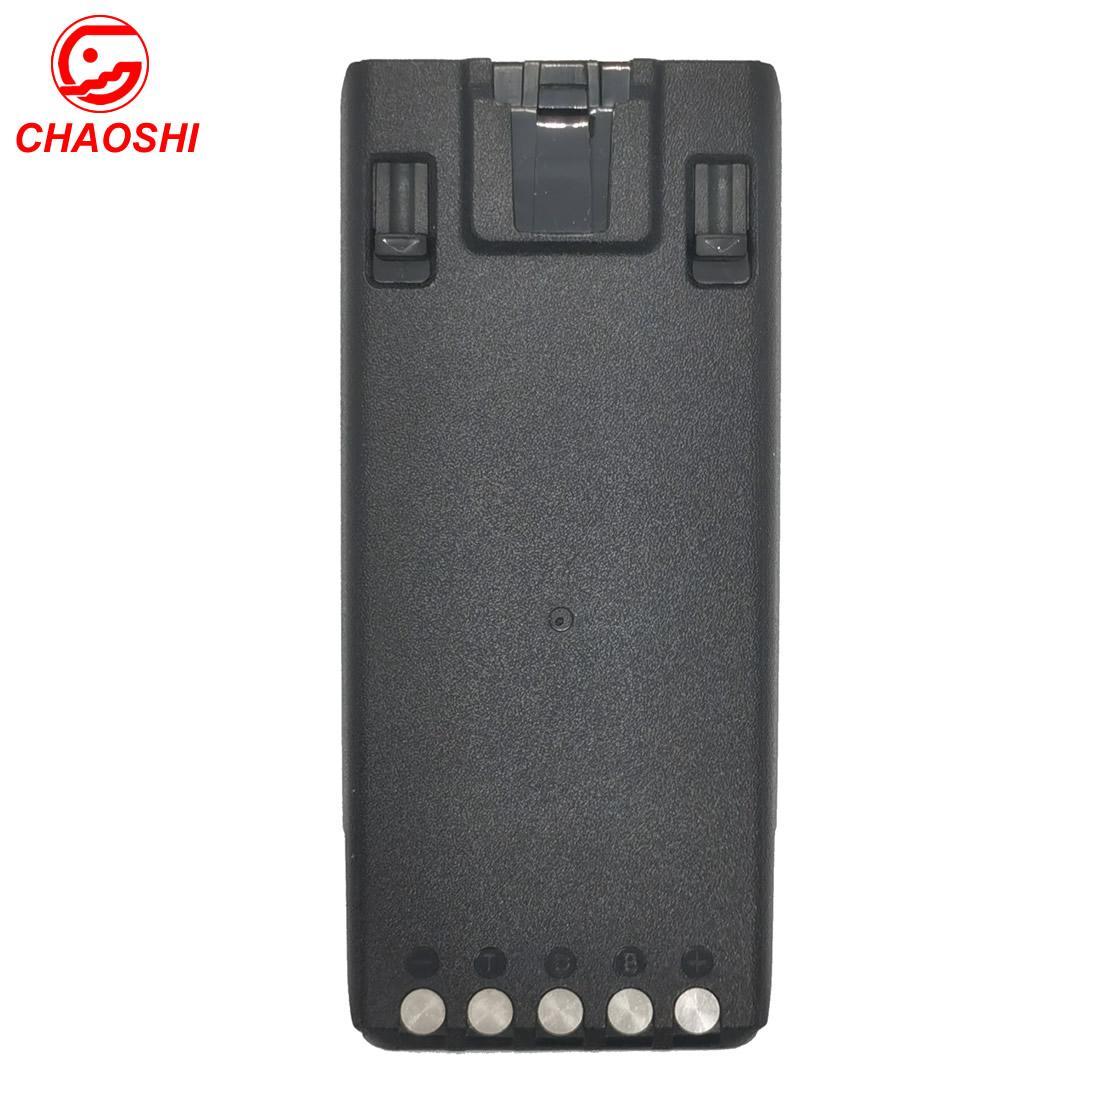 BP283對講機電池 IC-F3400D, IC-F4400D, IC-F70 2